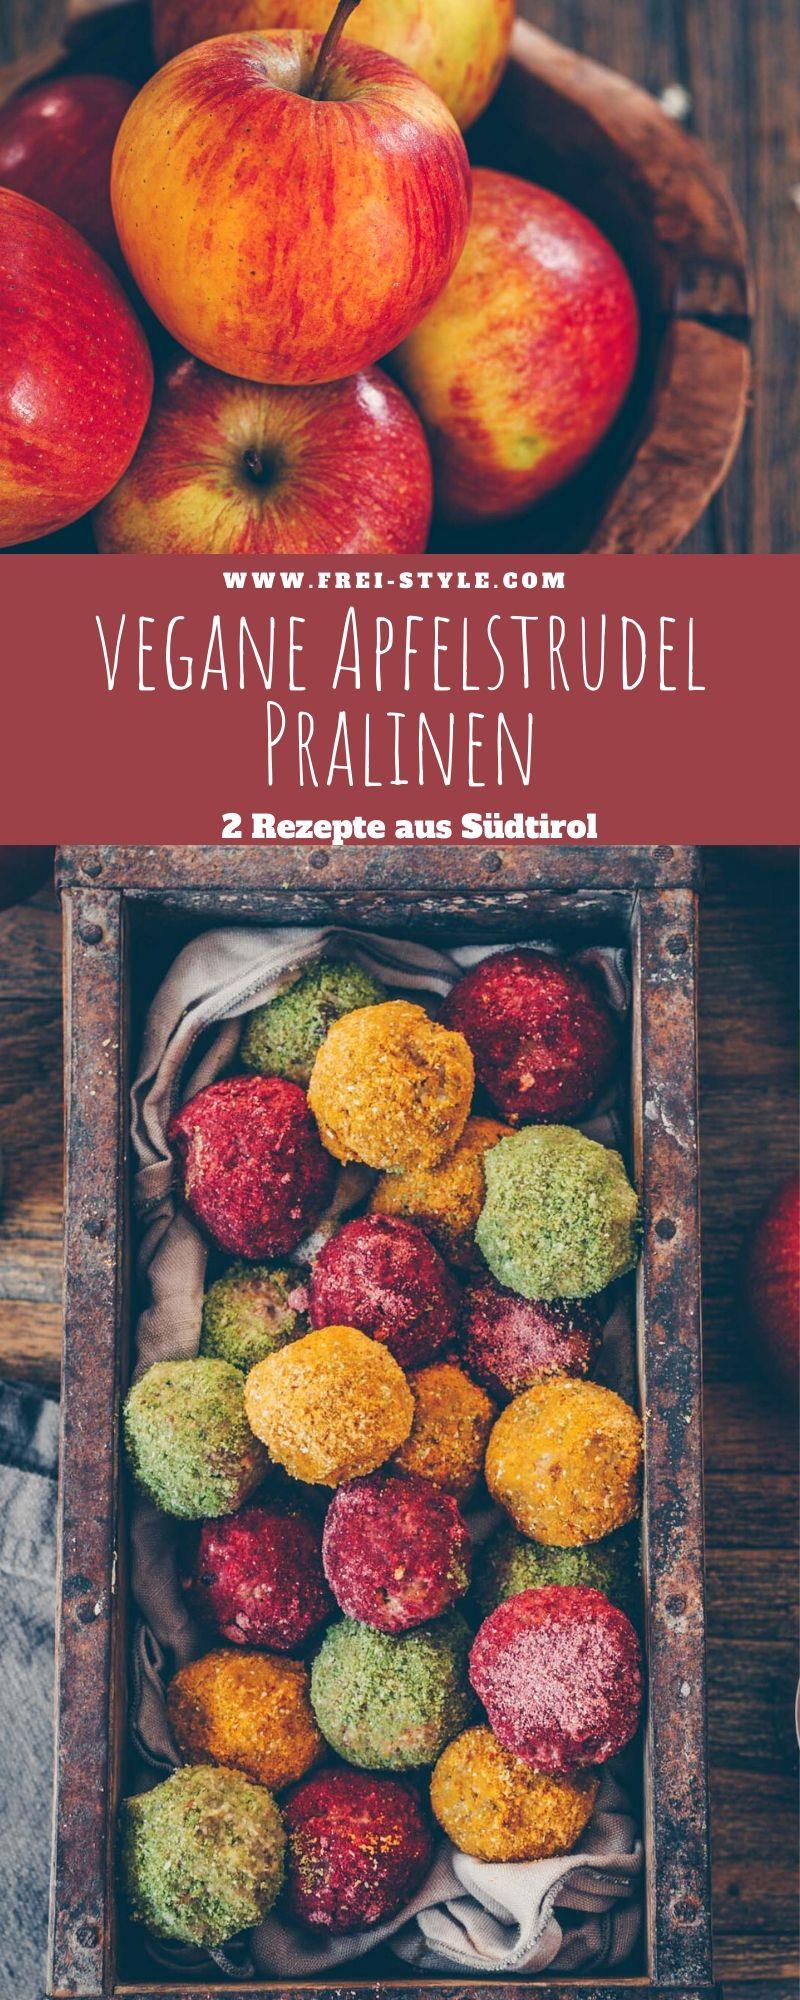 Vegane Apfelstrudelpralinen - 2 Rezepte aus Südtirol